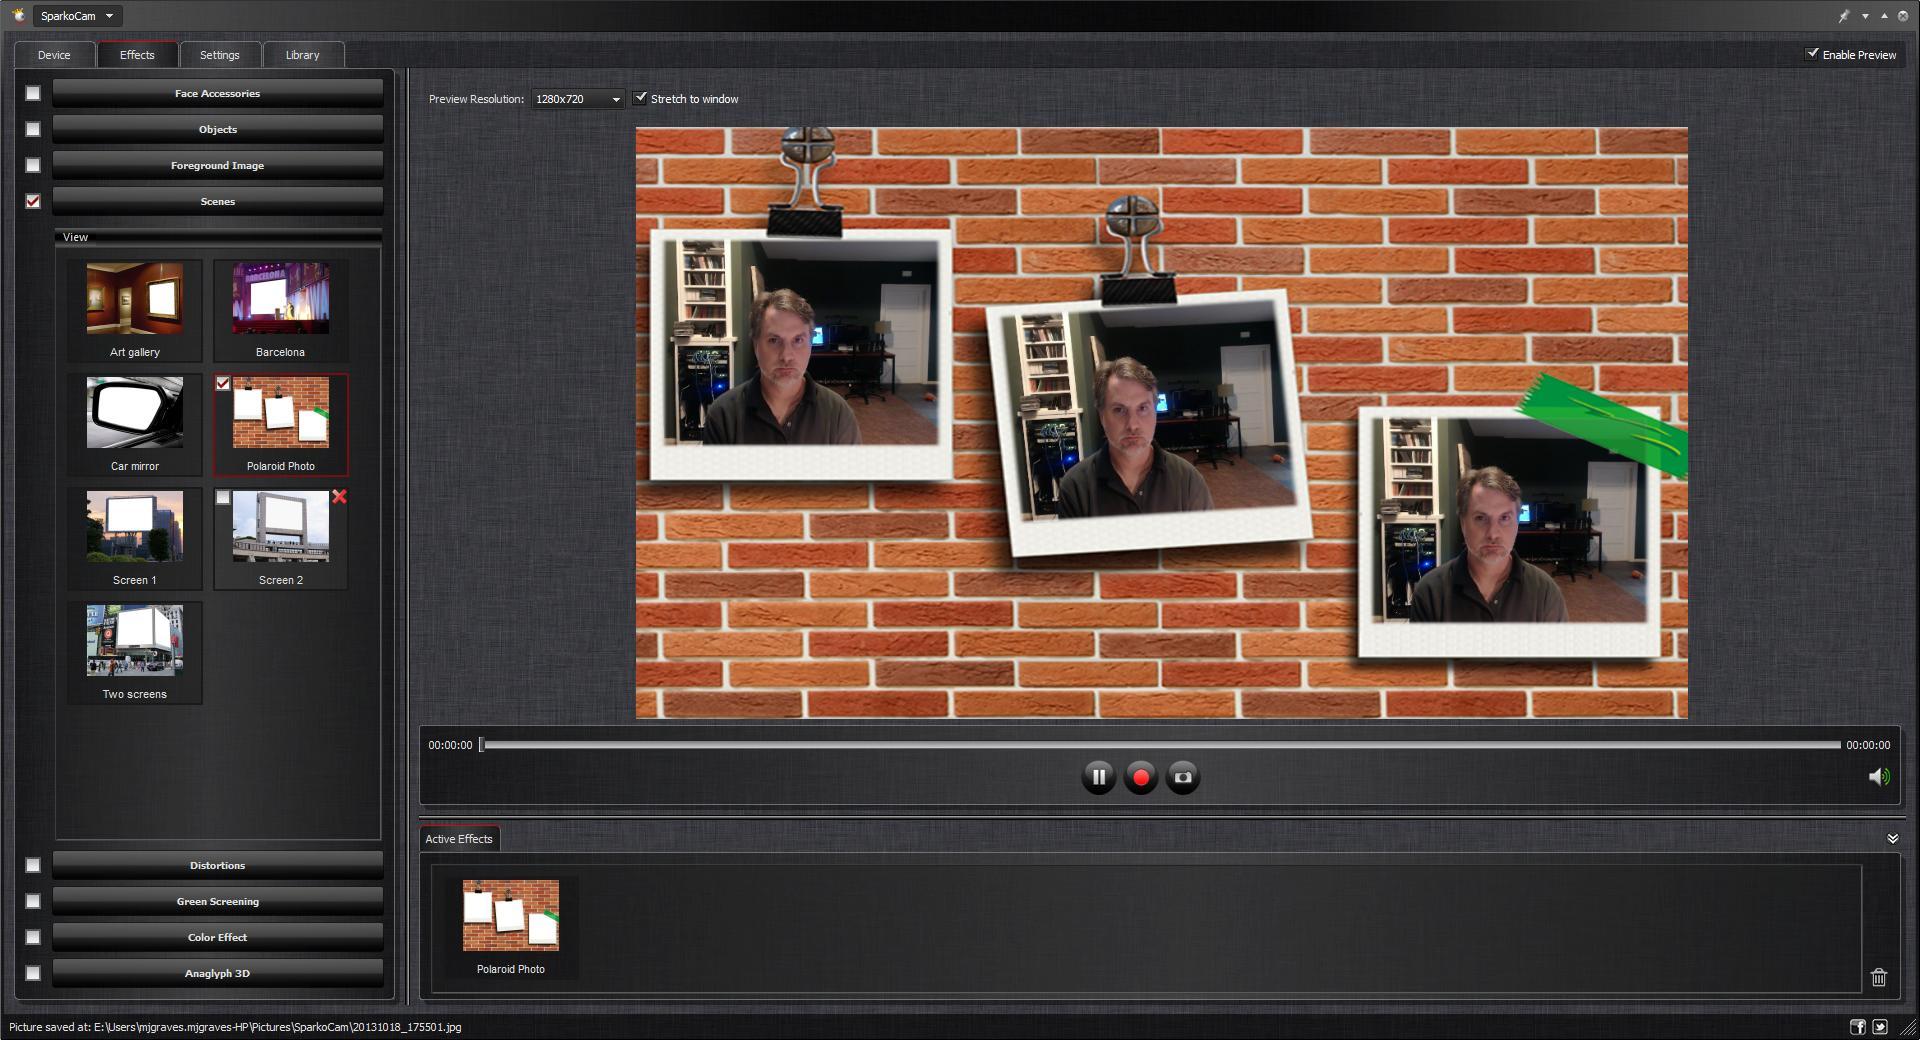 Webcams 5: SparkoCam & My Canon Rebel XSi | Graves On SOHO Technology